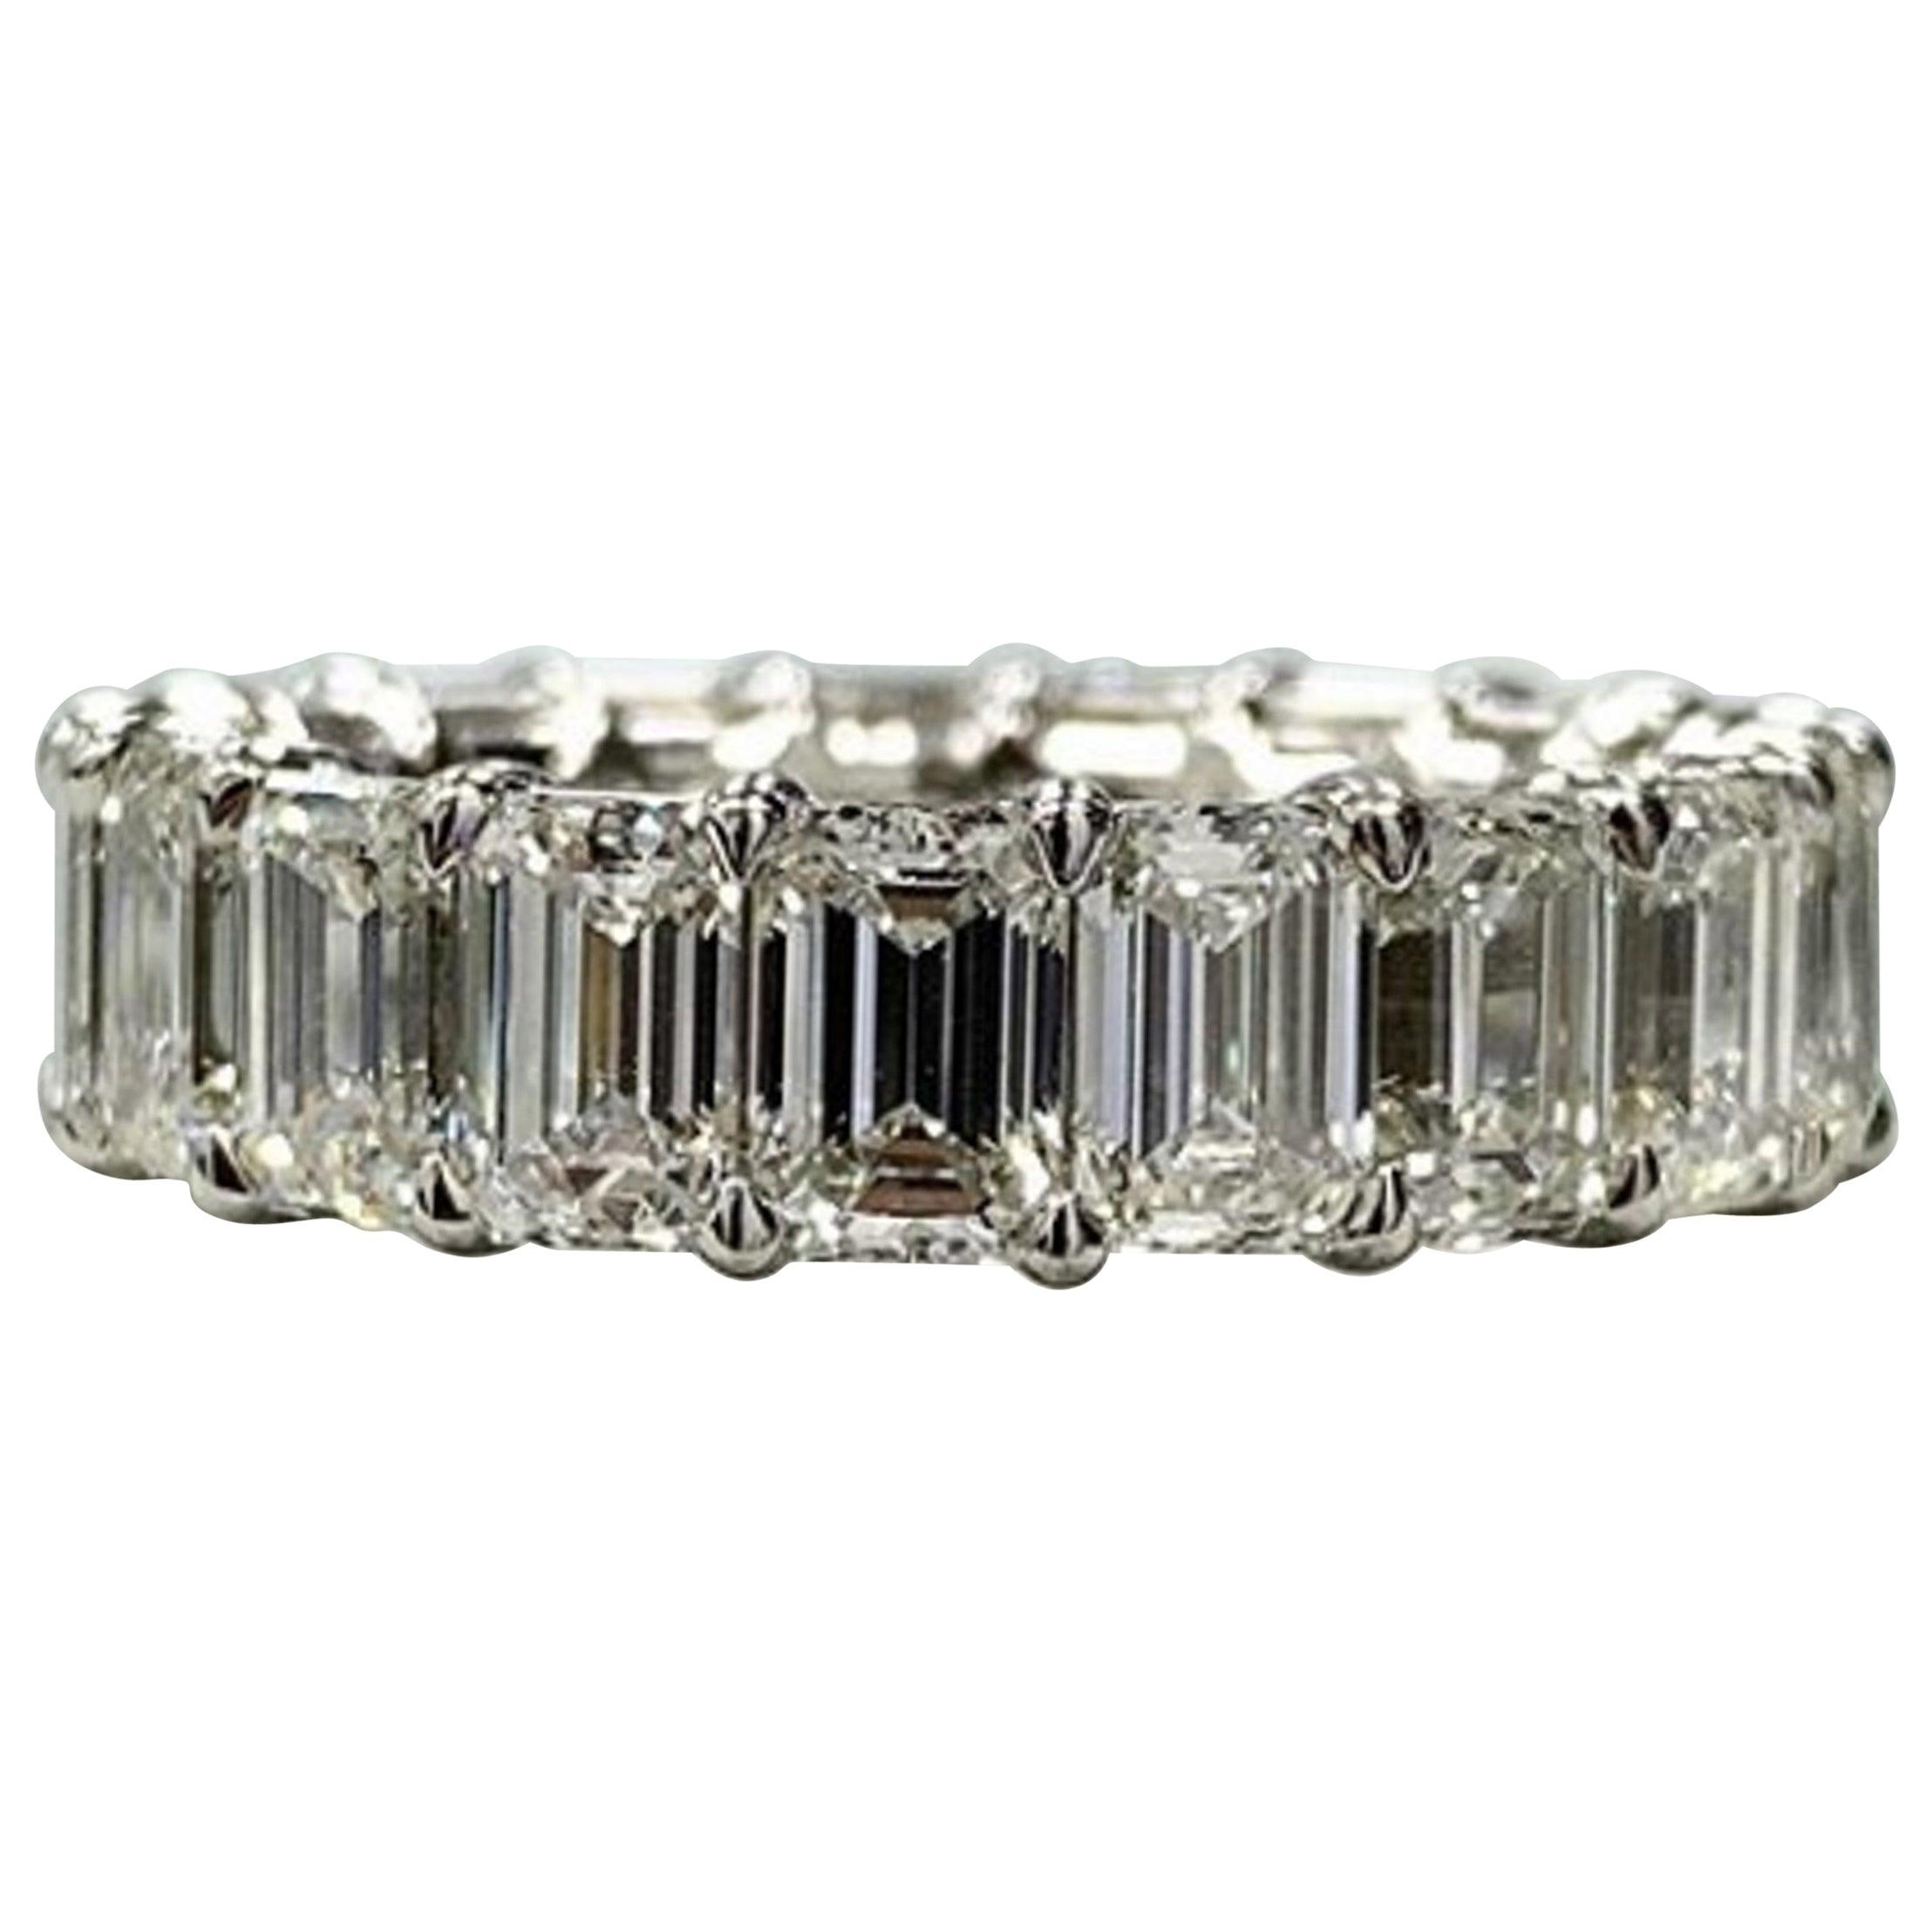 5 Carat Natural Untreated Eternity Band Emerald Cut Diamond Ring